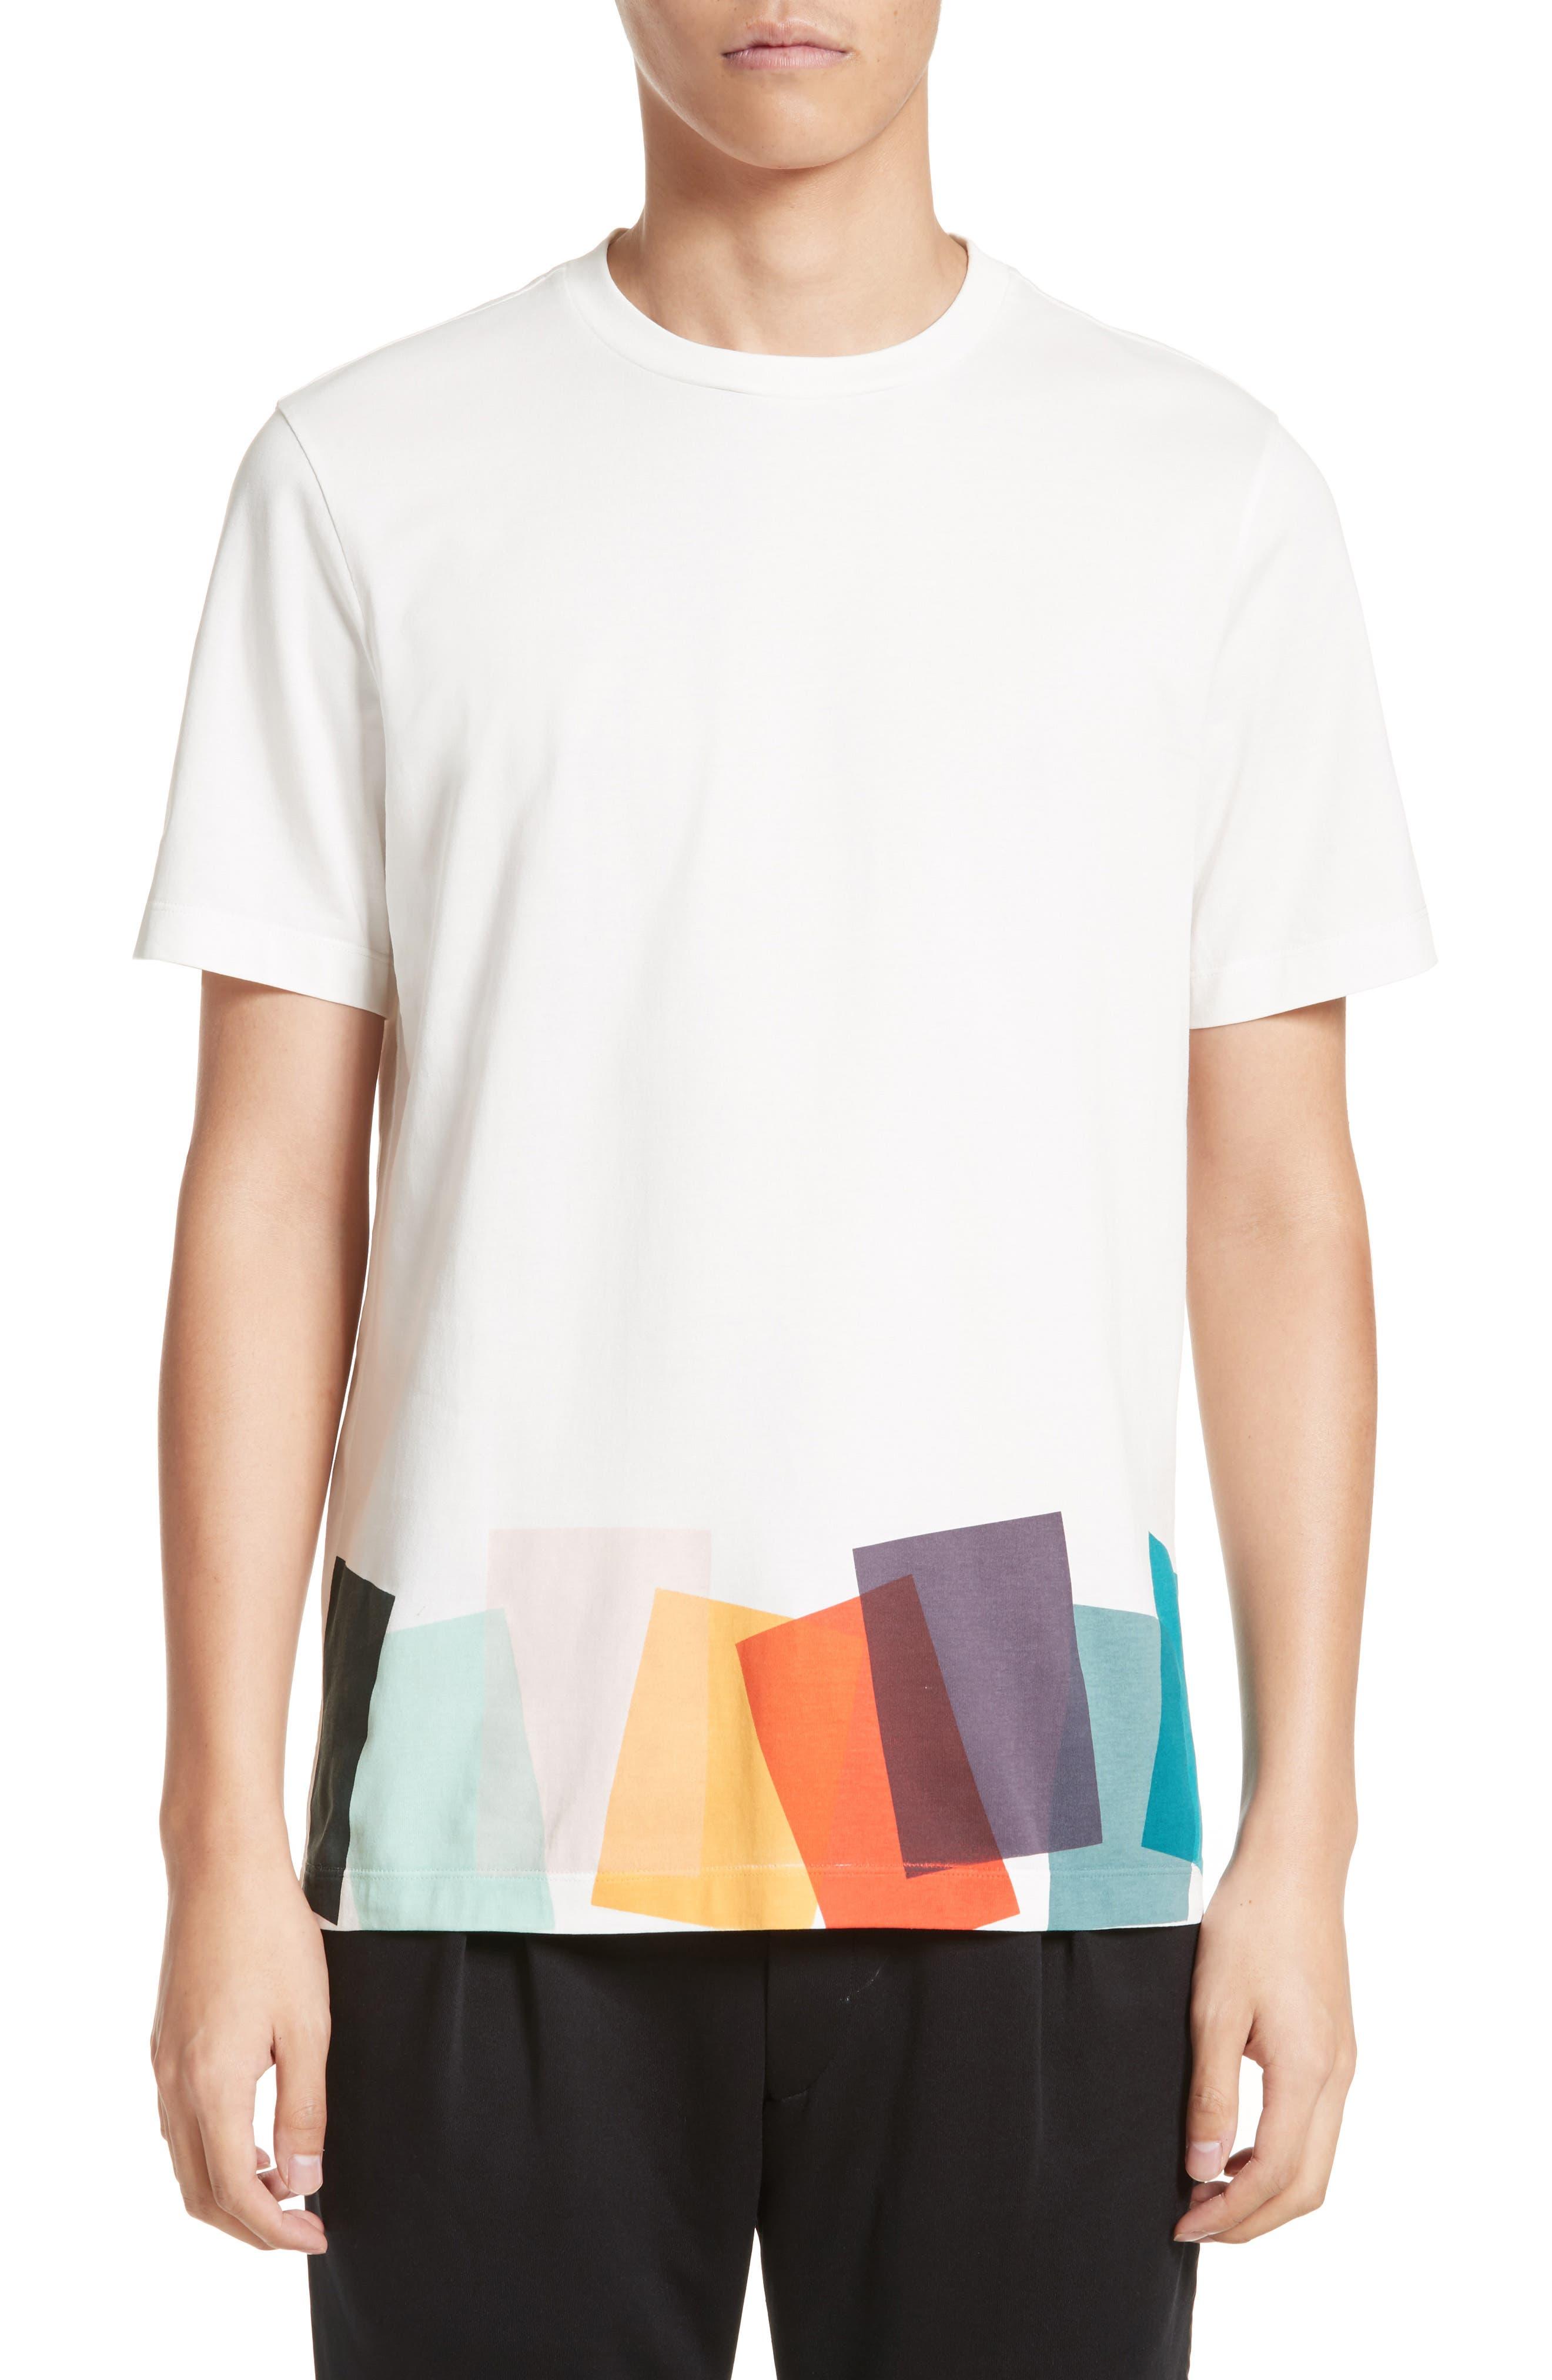 Main Image - Paul Smith Colorblock Print T-shirt